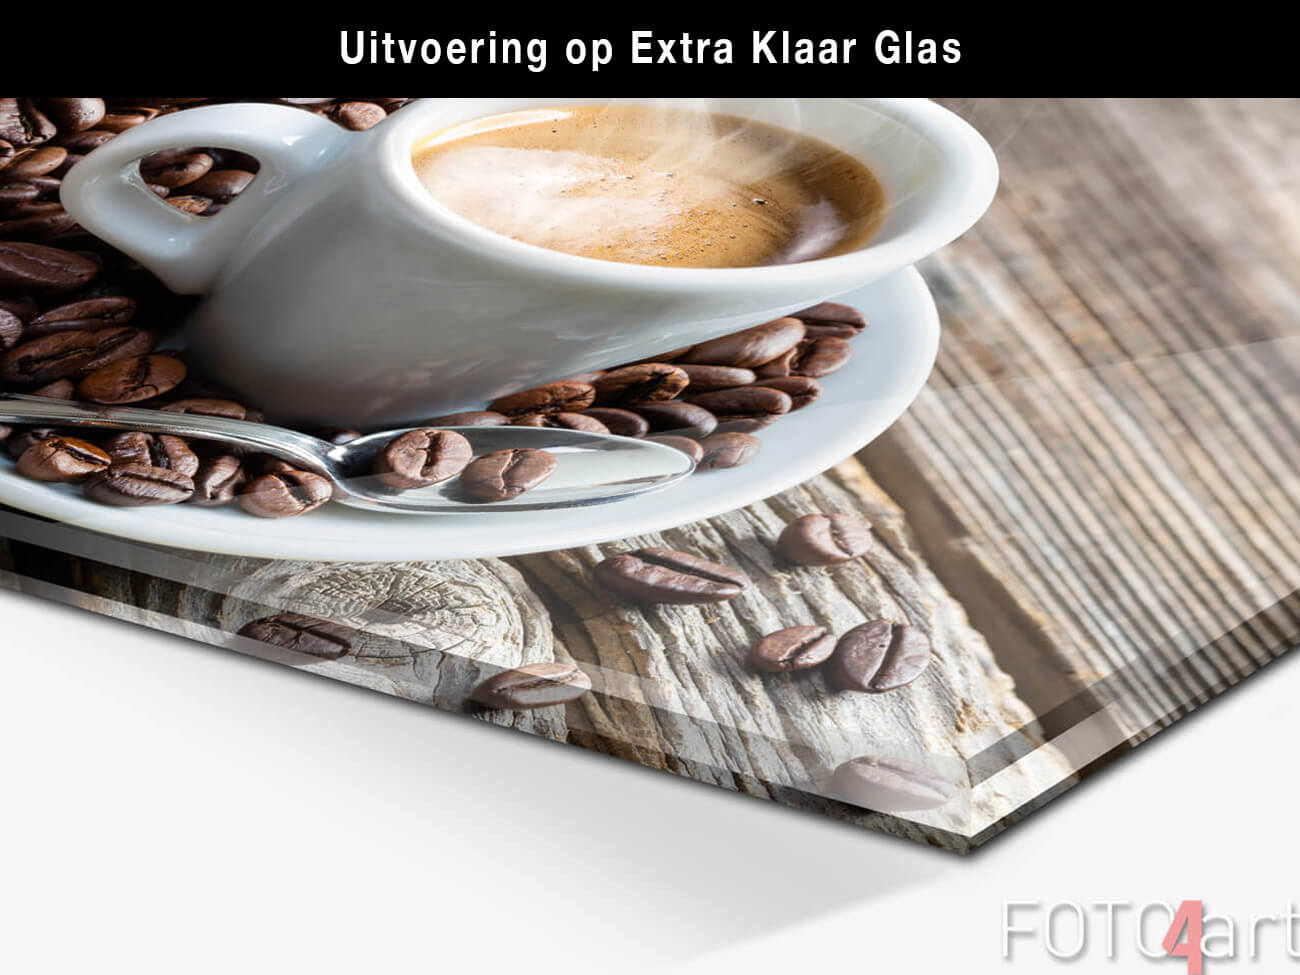 Extra Klaar Glas